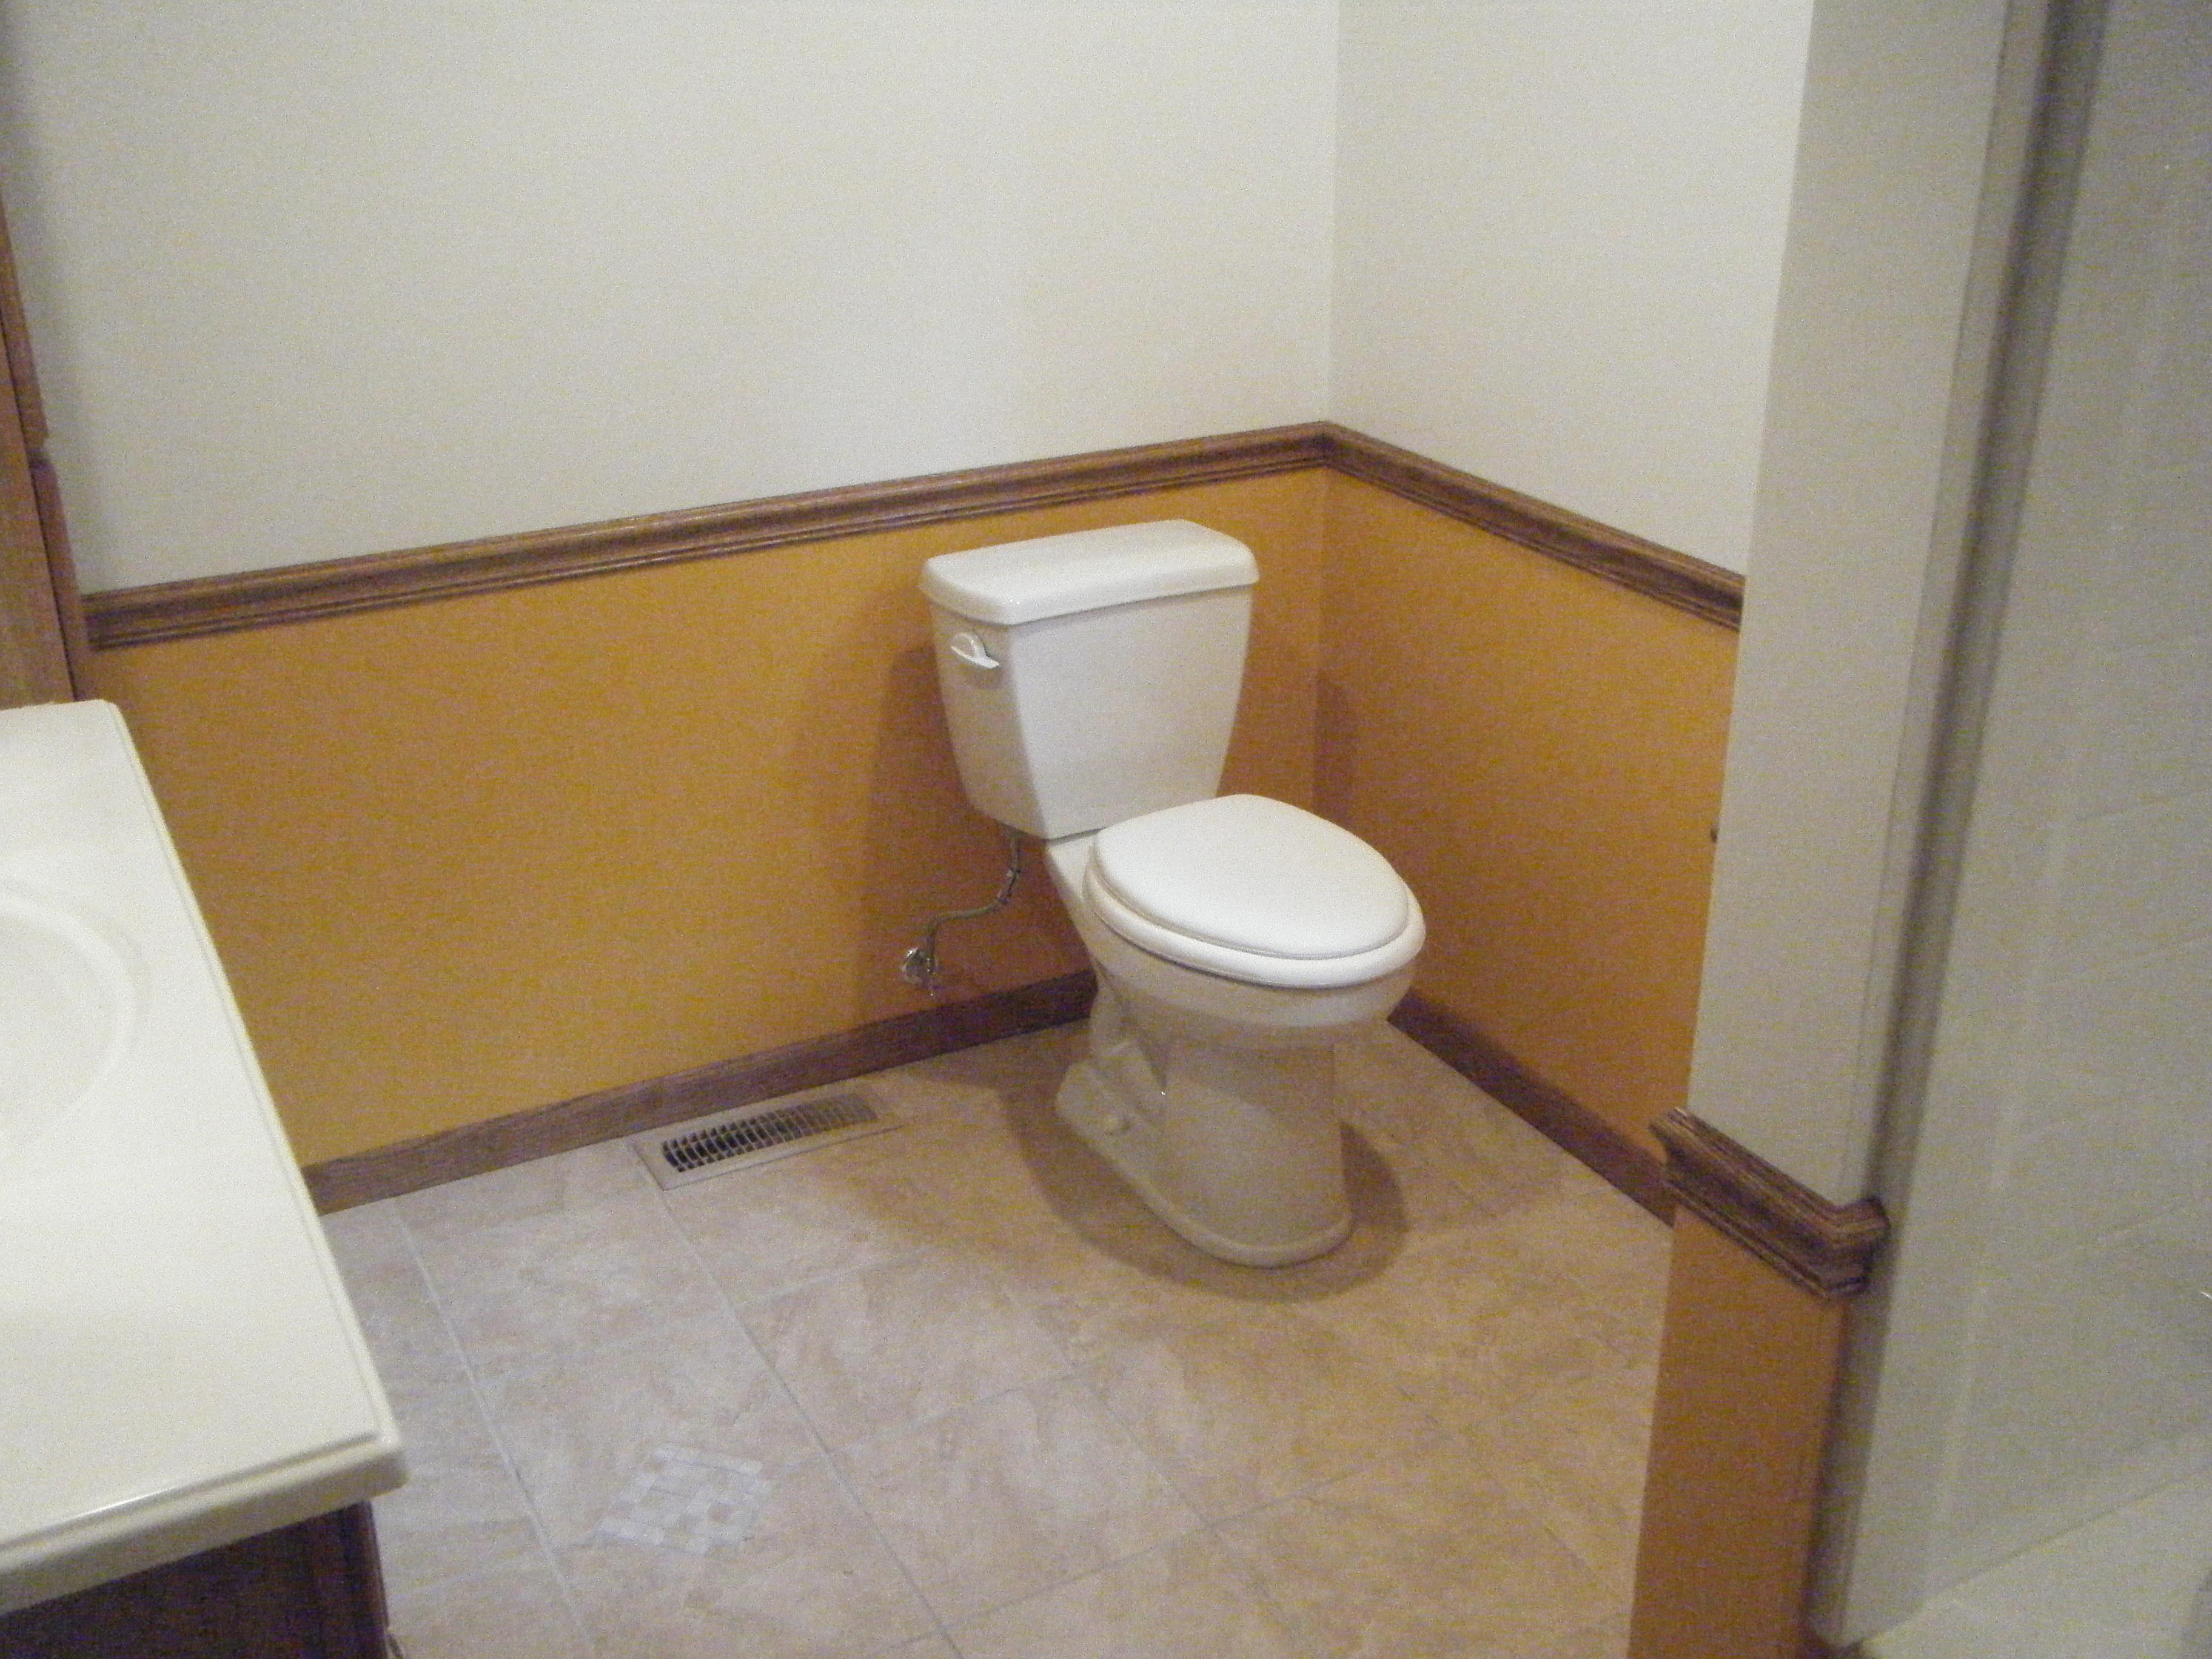 Boardman - Bathroom remodel